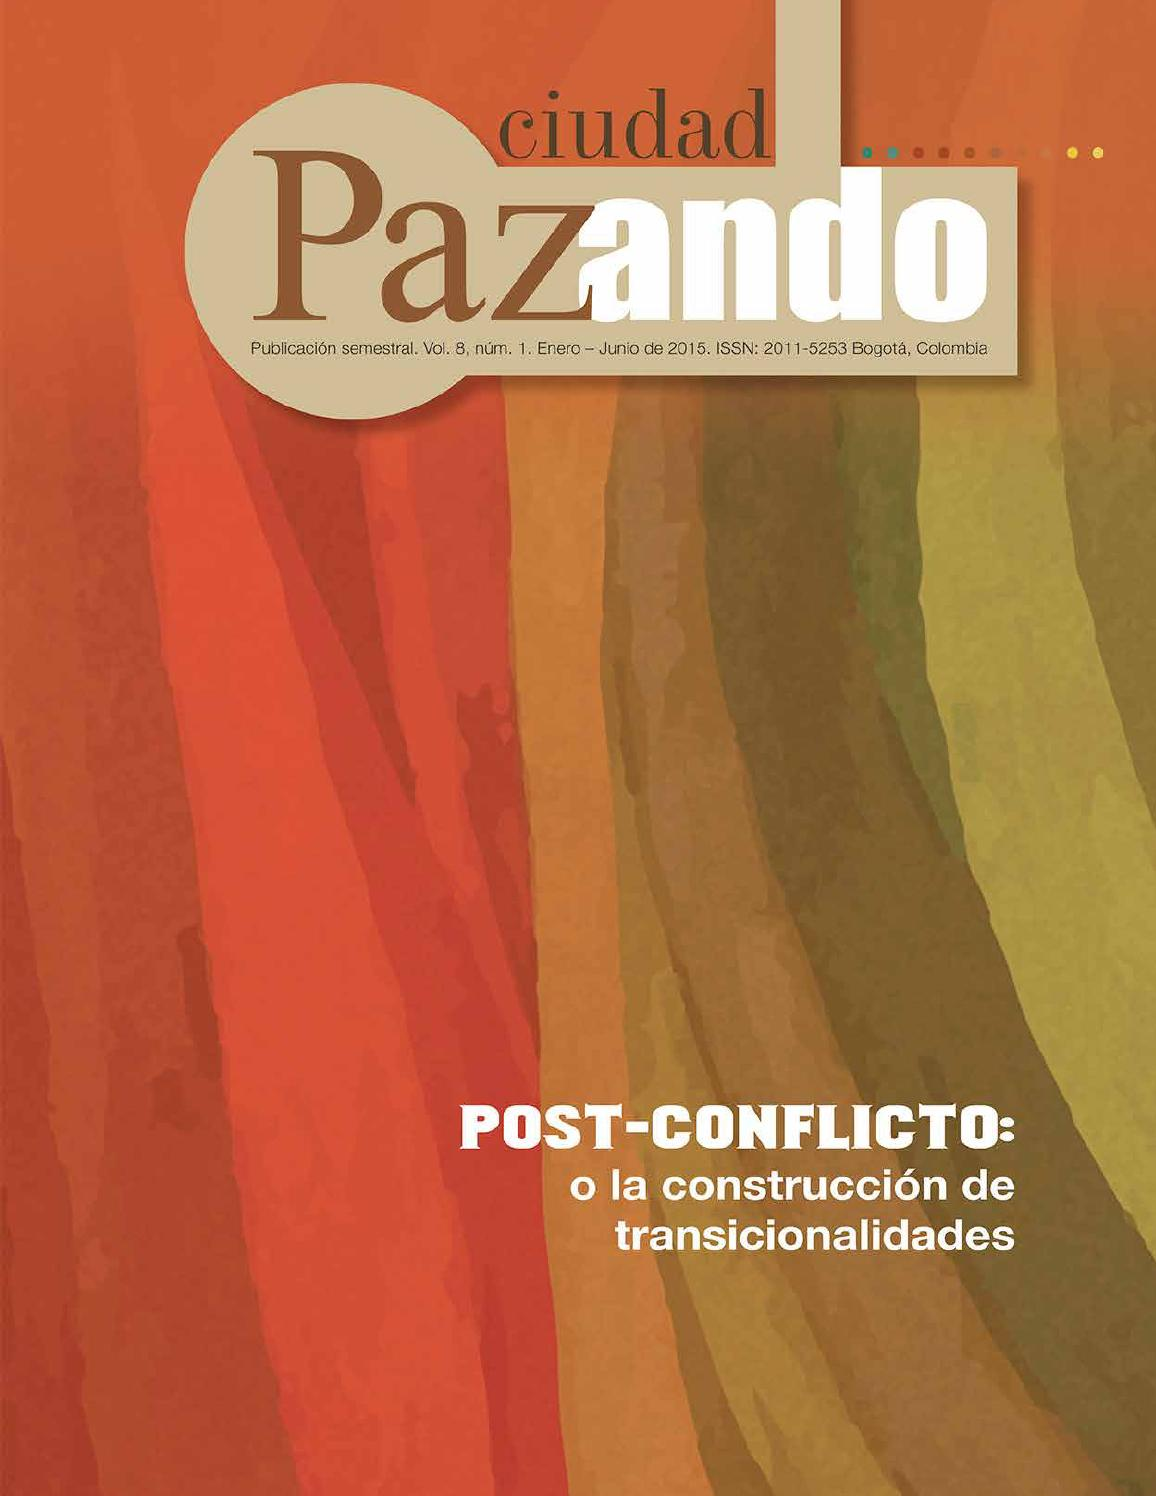 Revista Ciudad Paz-ando V8N1 by Ipazud Udistrital - issuu